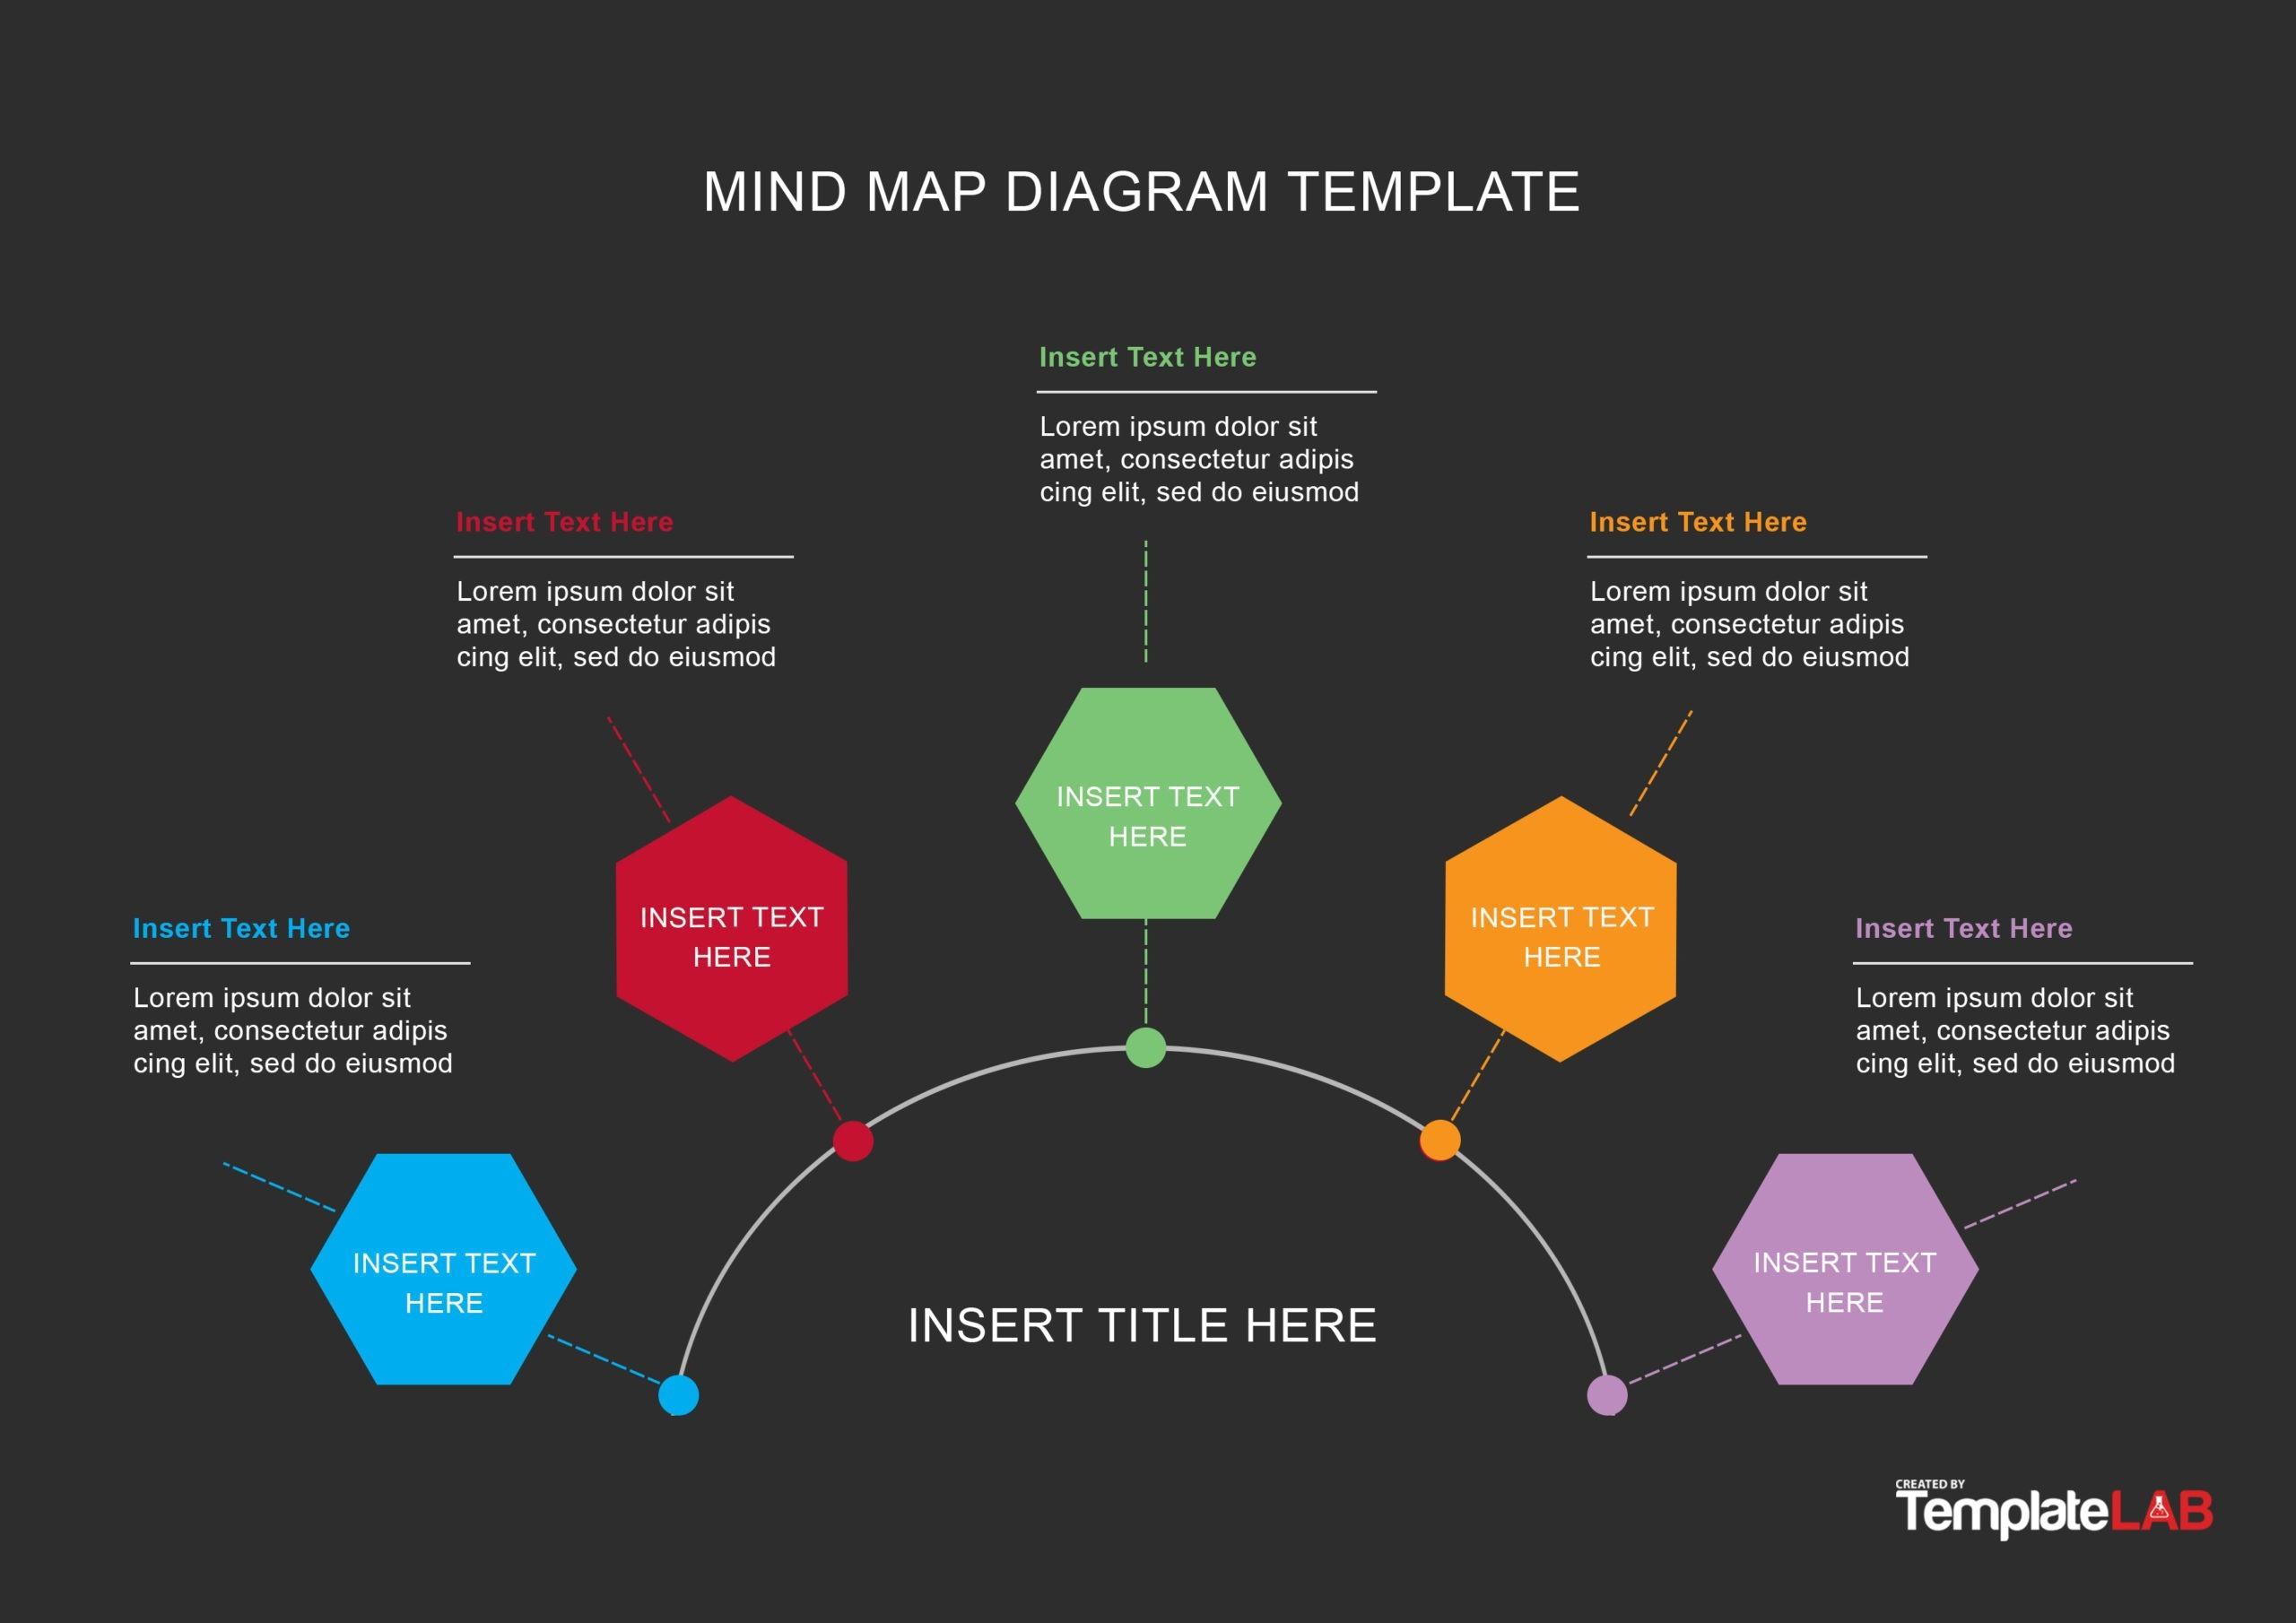 Free Mind Map Template 08 - TemplateLab.com